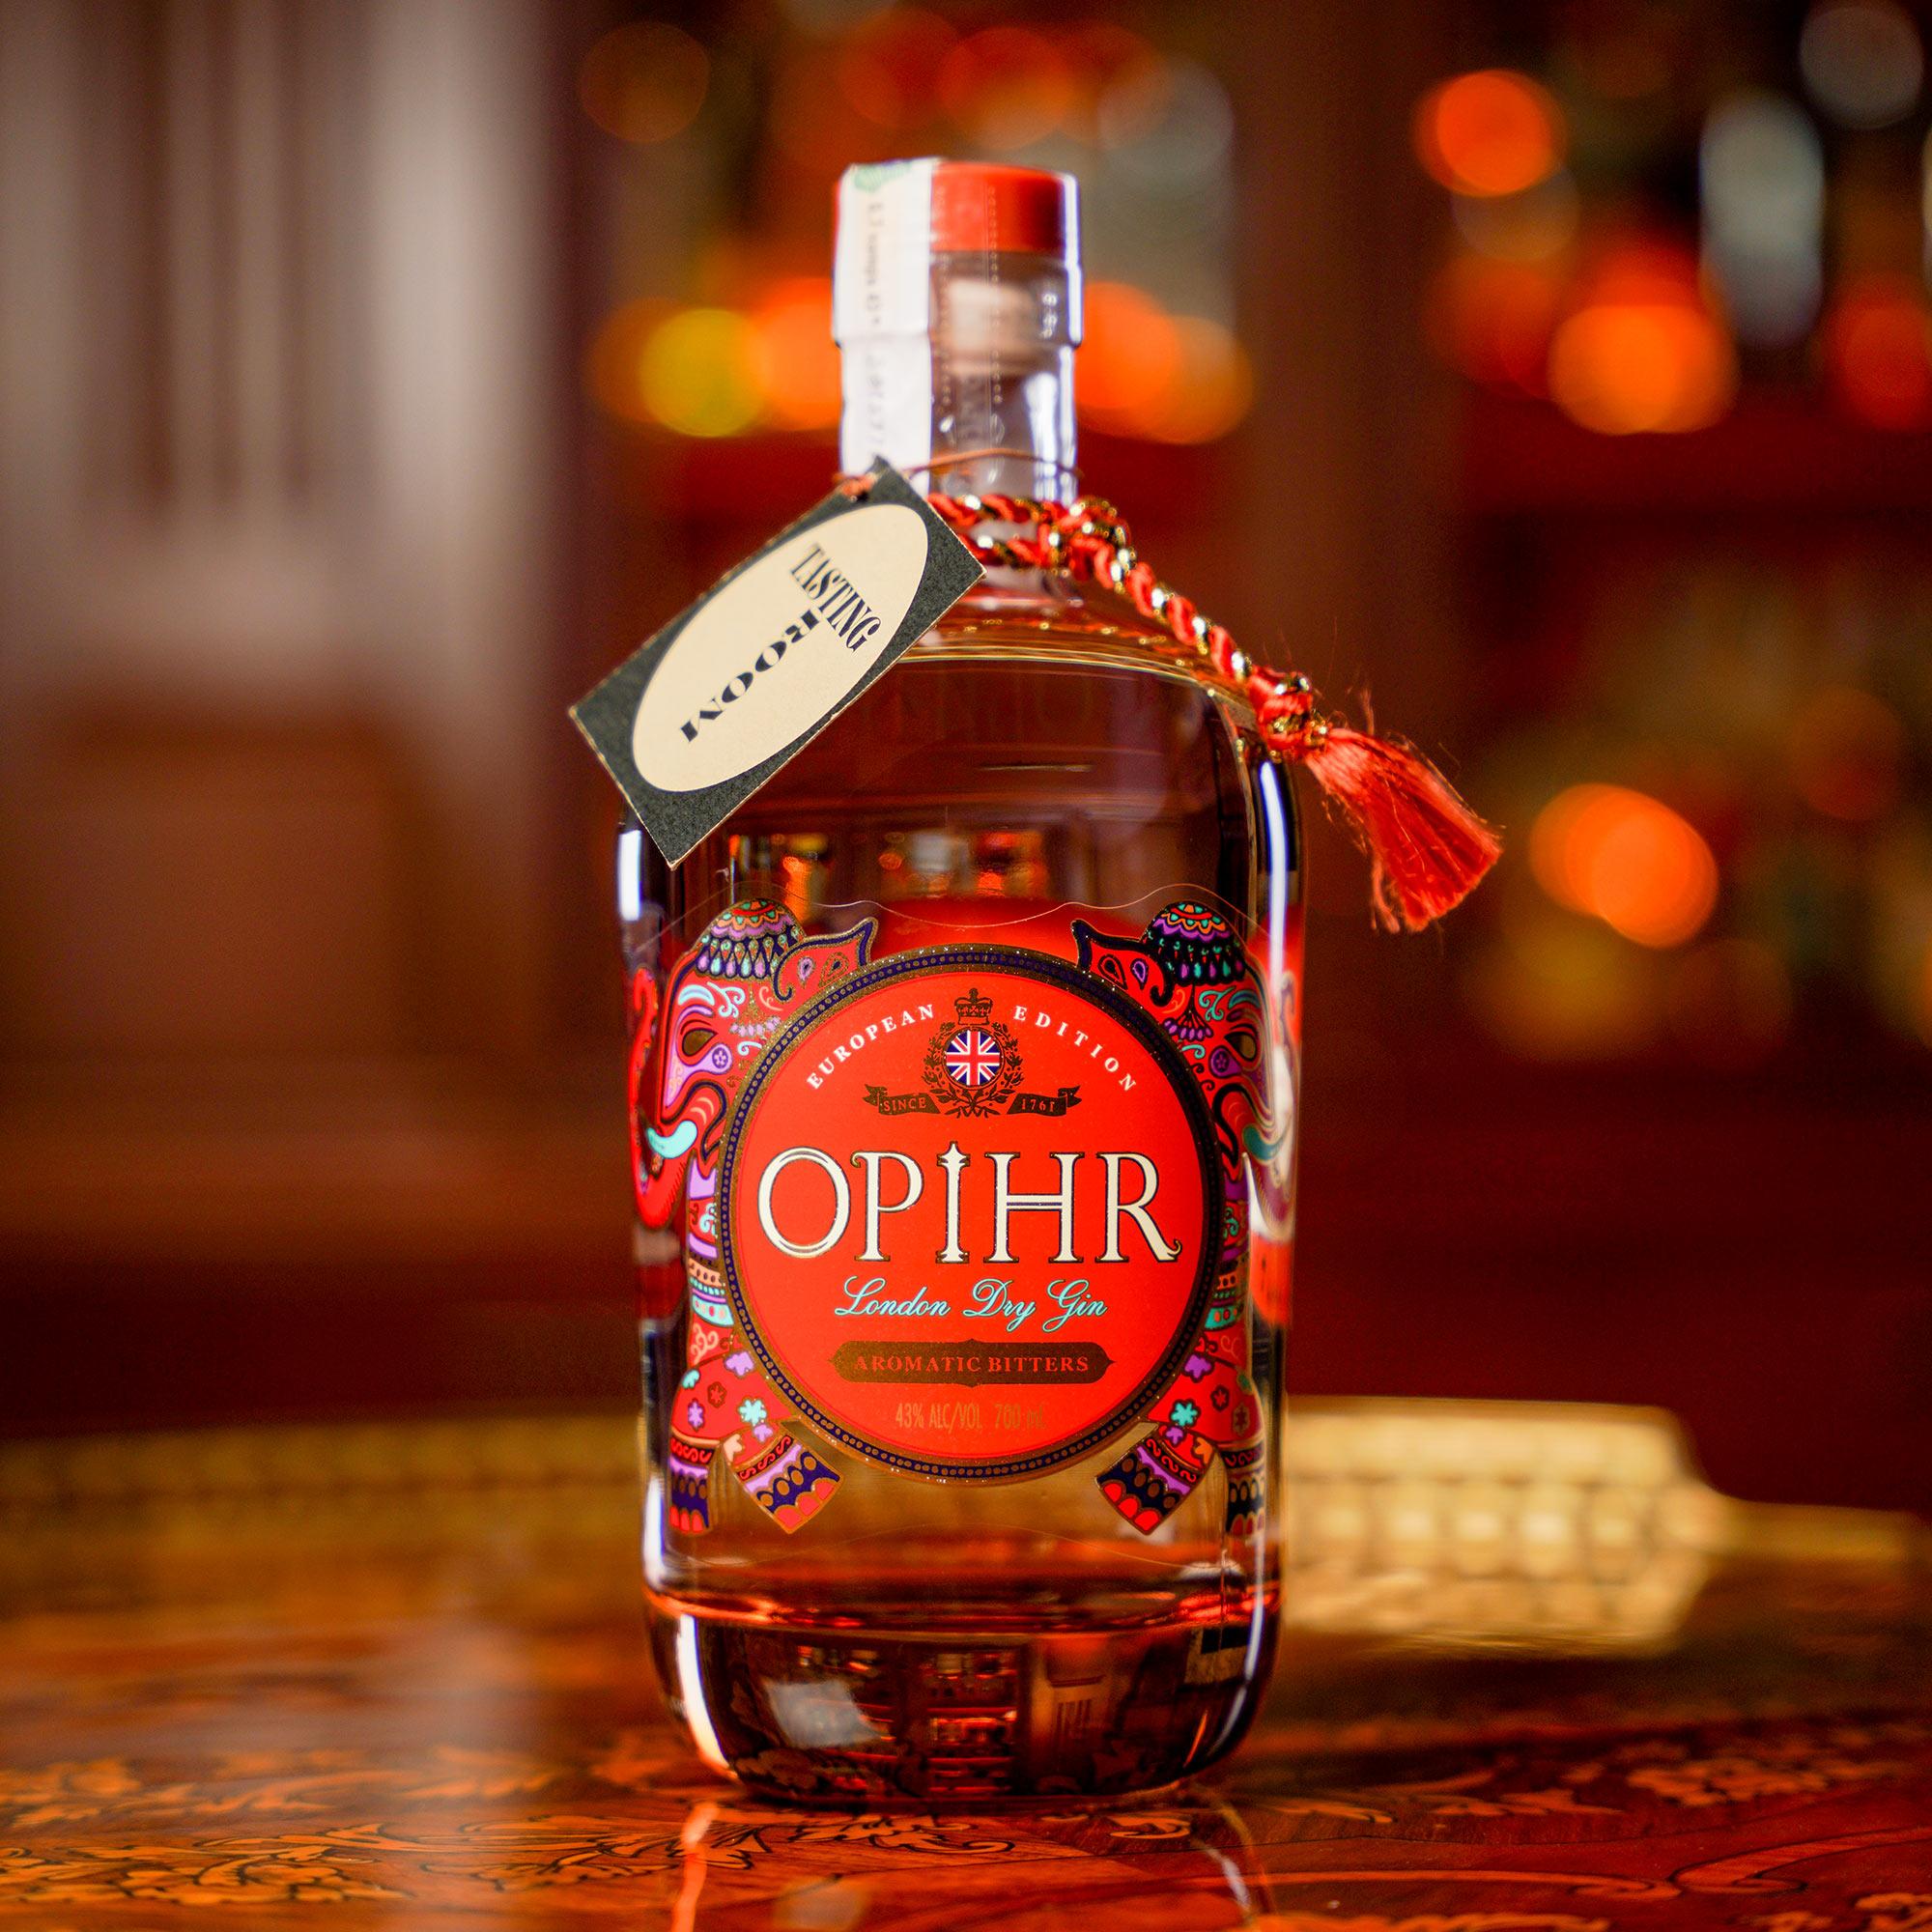 Opihr European Edition-Aromatic Bitters Gin /Опир Ароматик Битер Европейско издание Джин